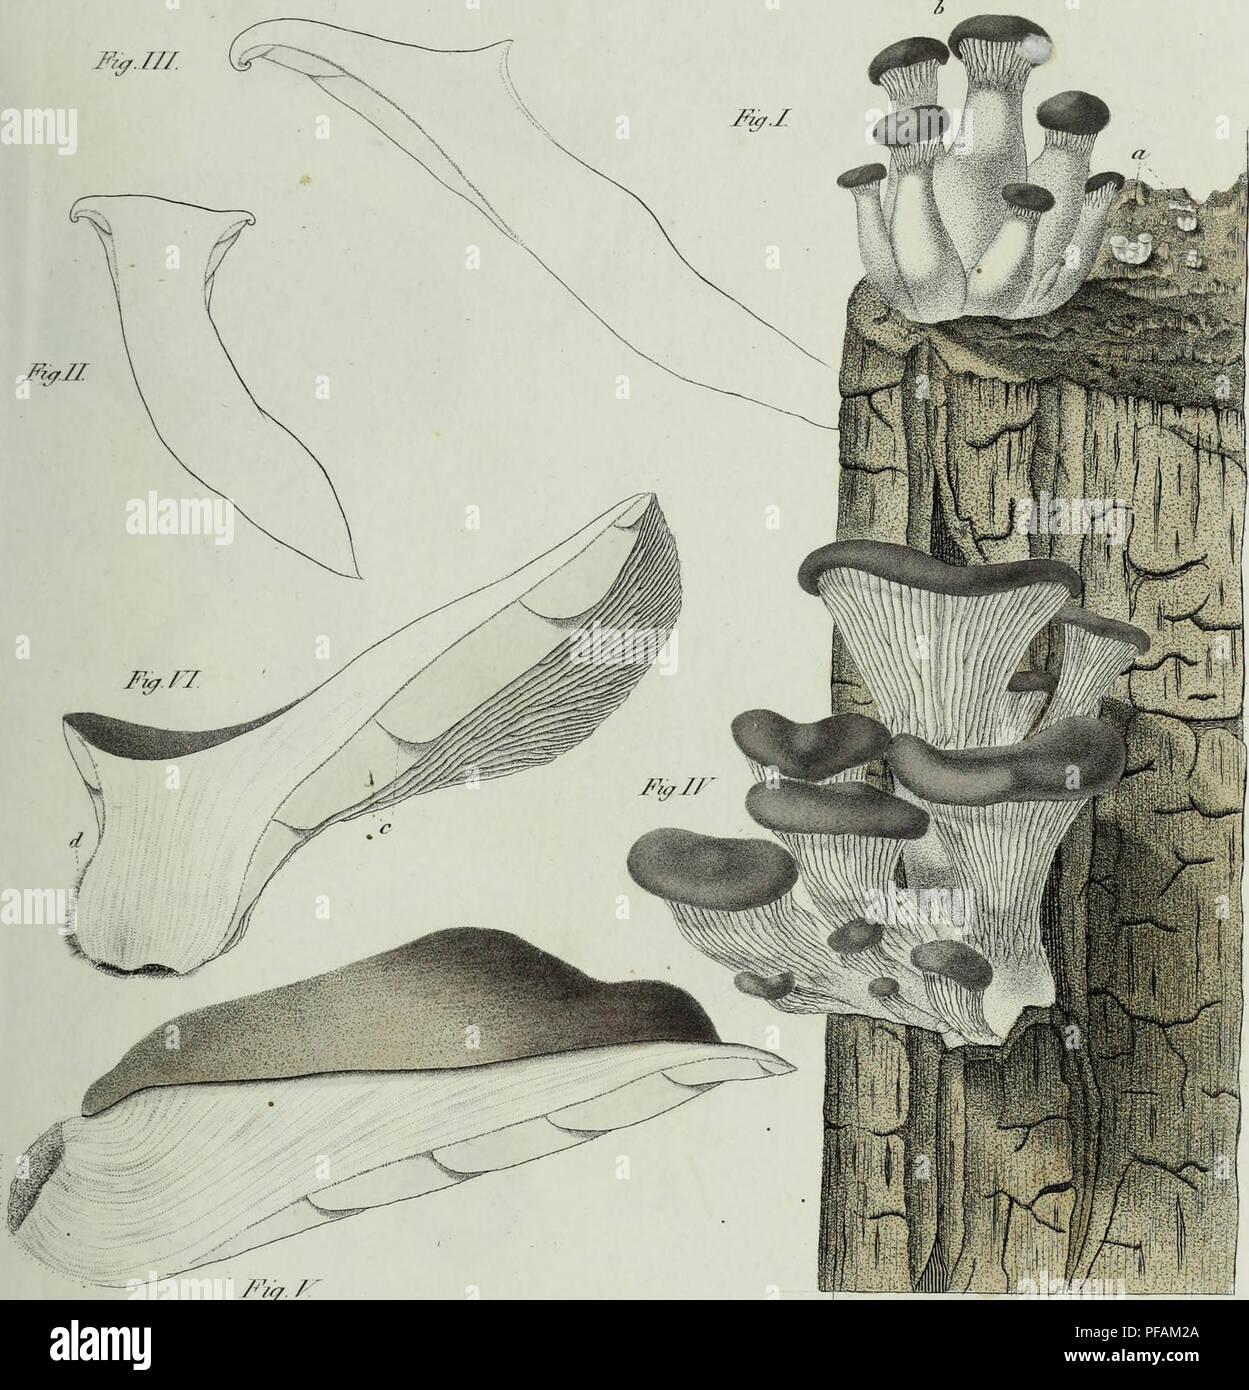 ". Descrizione dei funghi mangerecci più comuni dell'Italia e de' velenosi che possono co' medesimi confondersi. Fungi; Mushrooms. Tft. ""***V F&. / < Pz&atUra aa //rr/ì/r,T. Please note that these images are extracted from scanned page images that may have been digitally enhanced for readability - coloration and appearance of these illustrations may not perfectly resemble the original work.. Vittadini, Carlo; Cavagna Sangiuliani di Gualdana, Antonio, conte, 1843-1913, former owner. IU-R. Milano, Rusconi - Stock Image"